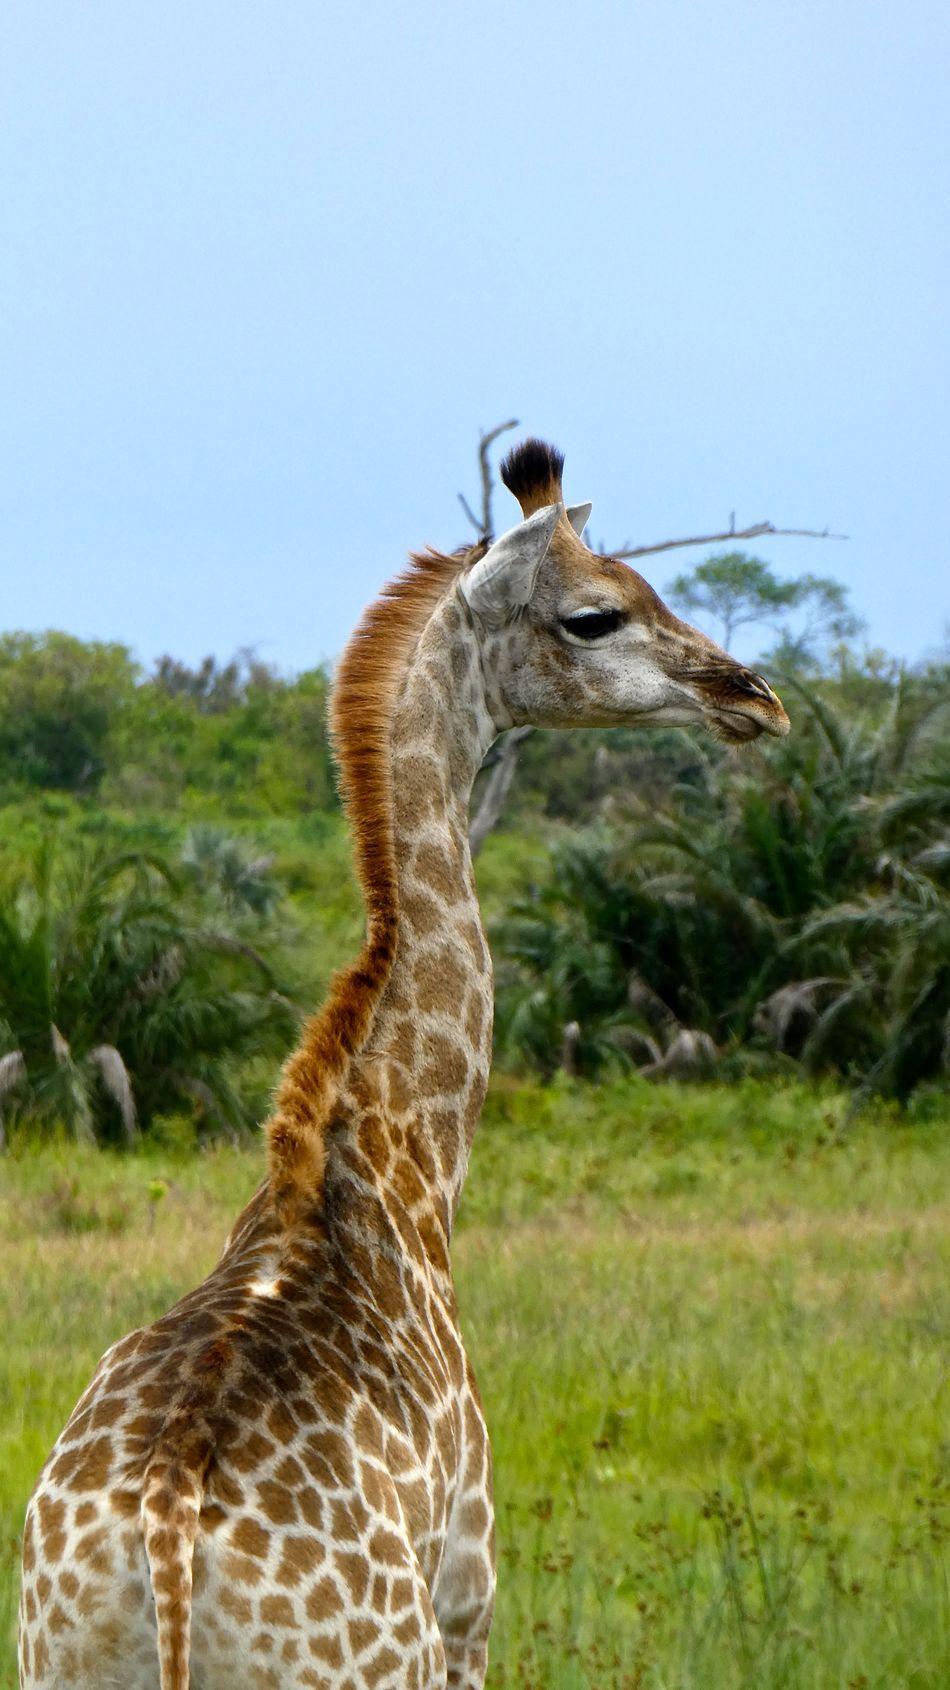 Animal Themes Animal Wildlife Animals In The Wild Day Giraff Giraffe Giraffe Giraffes Giraffe♥ Hluhluwe Mammal Nature No People Outdoors Safari Animals Southafrika St Lucia Wetland Park Südafrika